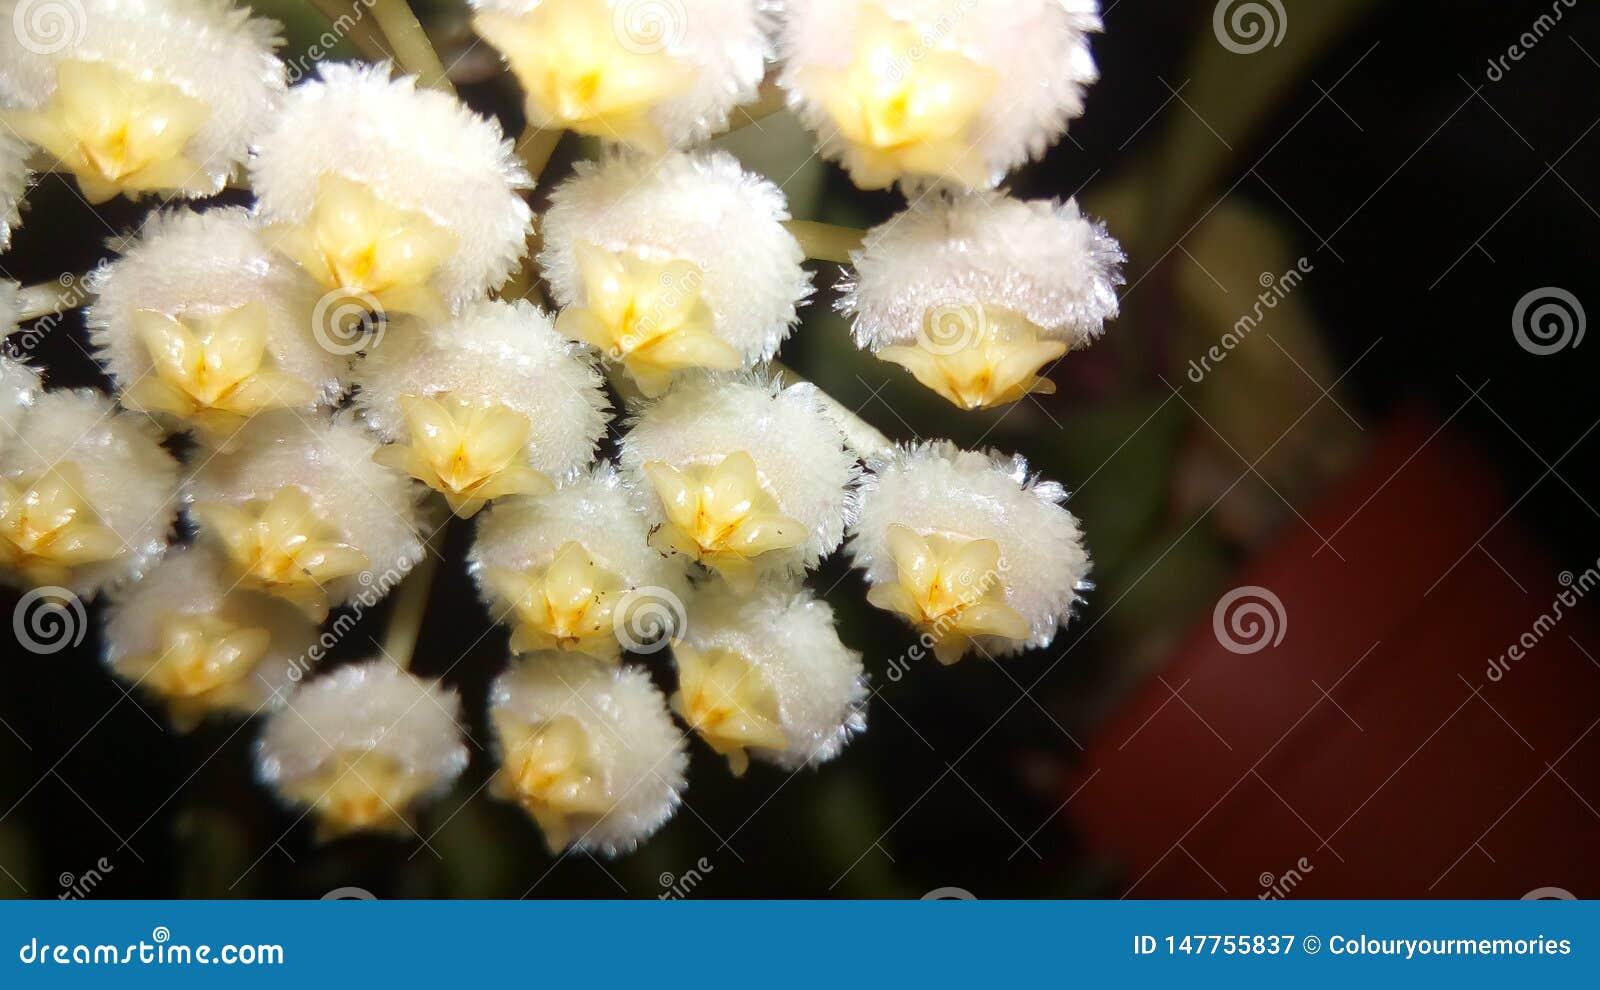 Hoya Lacunosa close up